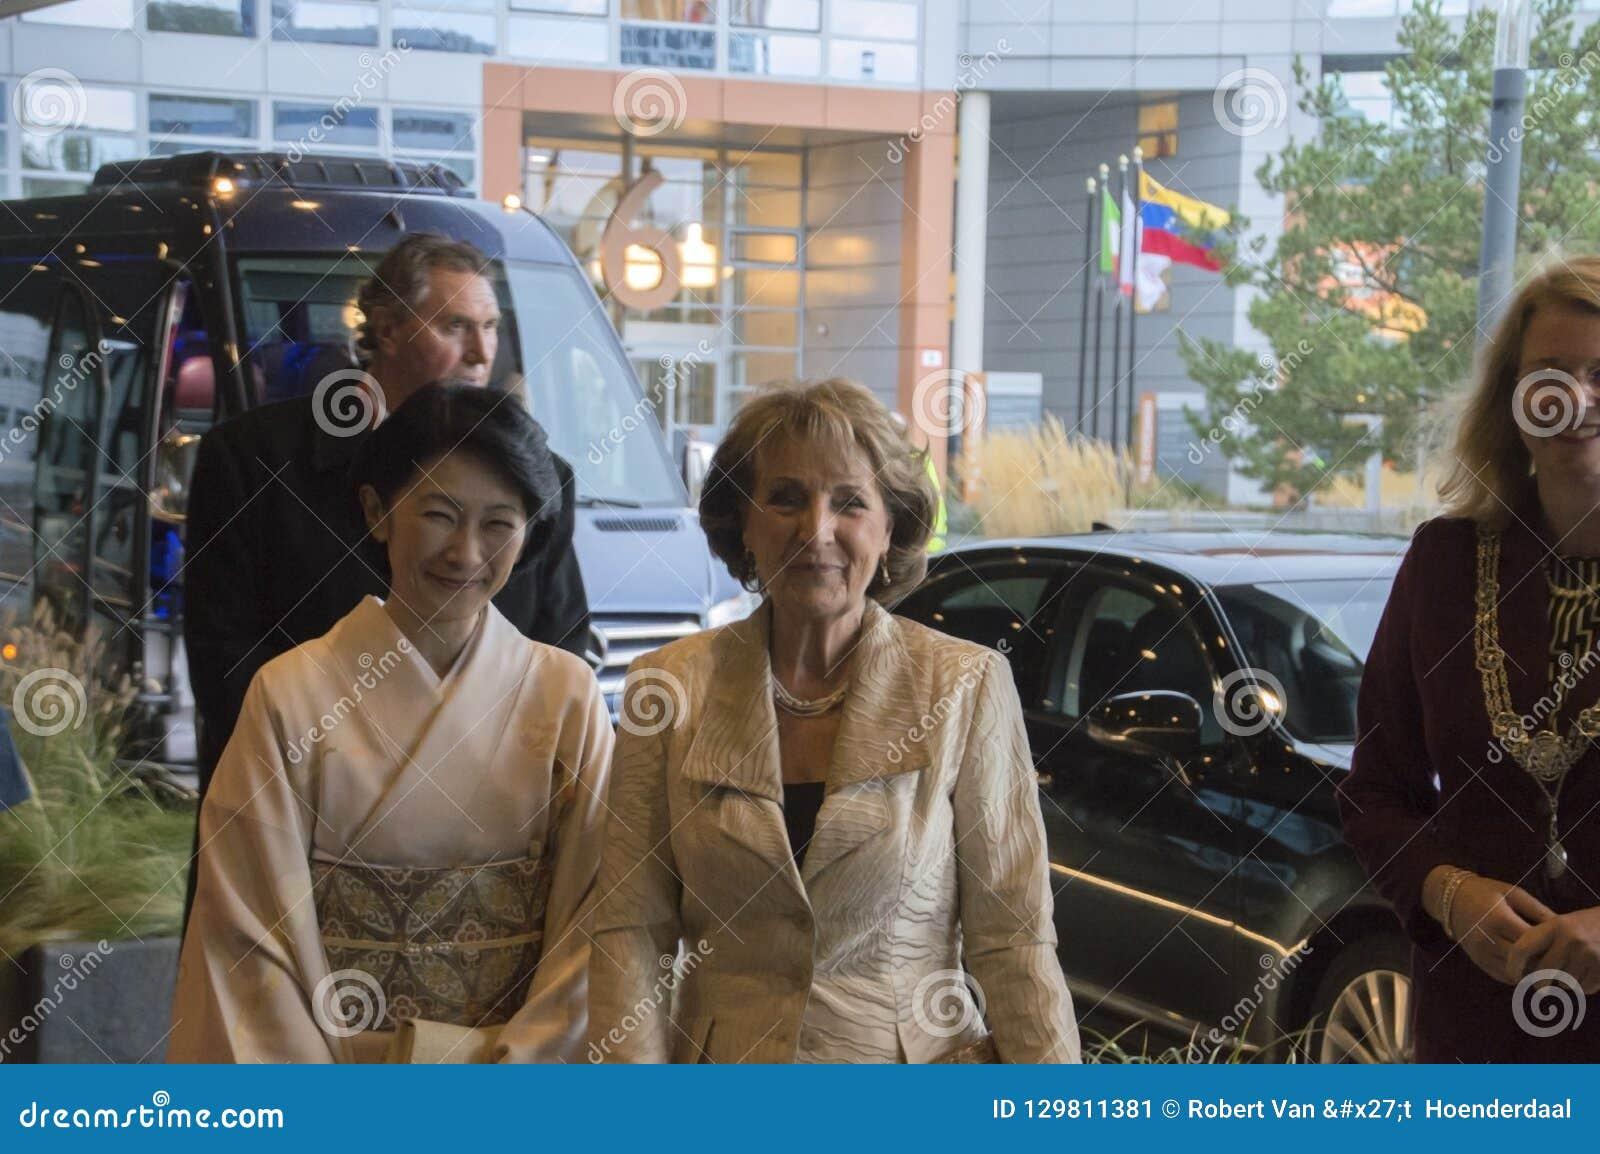 Magriet公主和秋筱宫At The World公主论坛小室Haag 对世界会议的仪式关于对抗TB的2018年